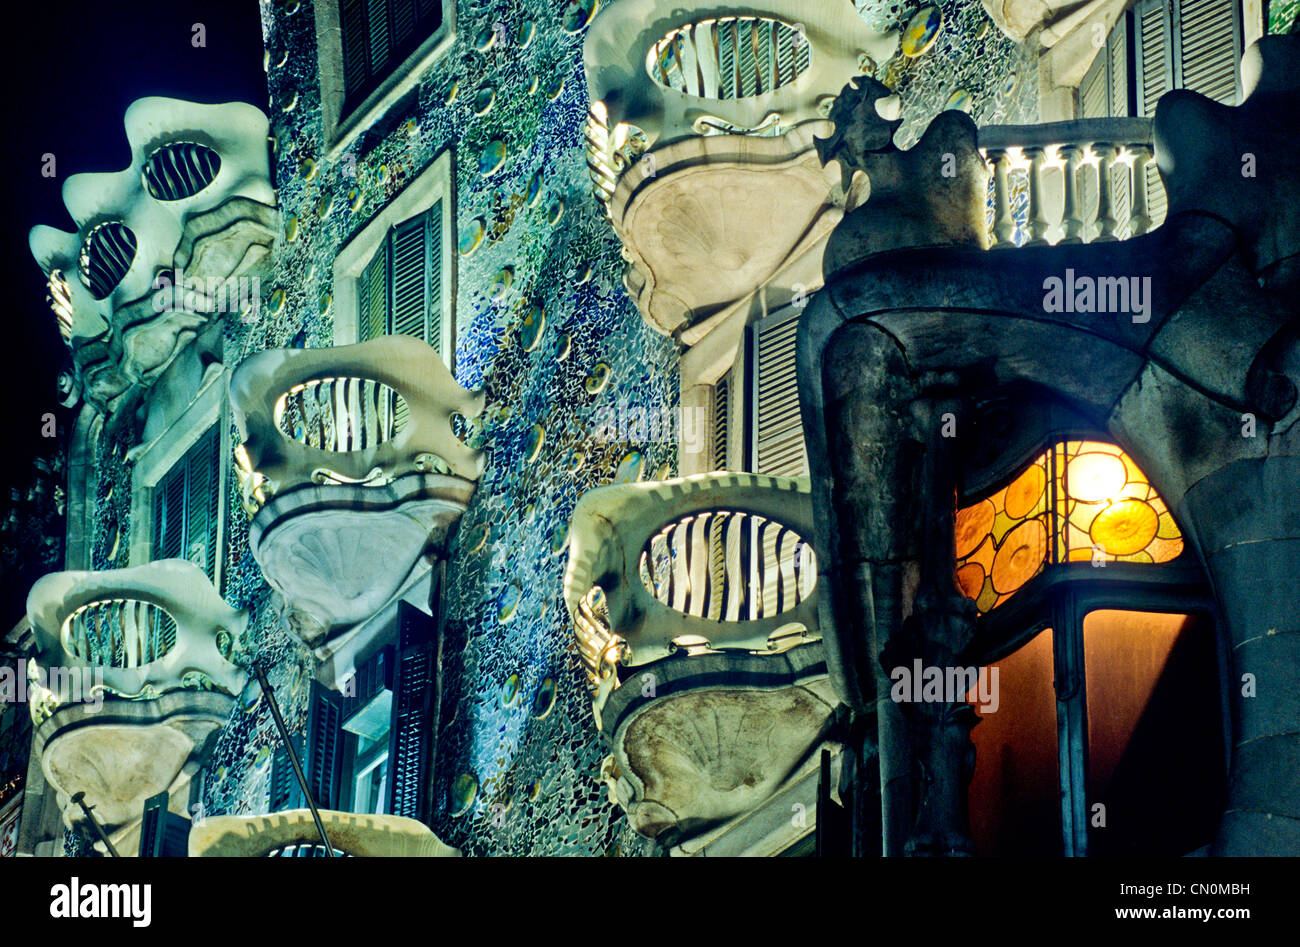 Spanien-Katalonien-Barcelona-Batlò-Haus Stockbild